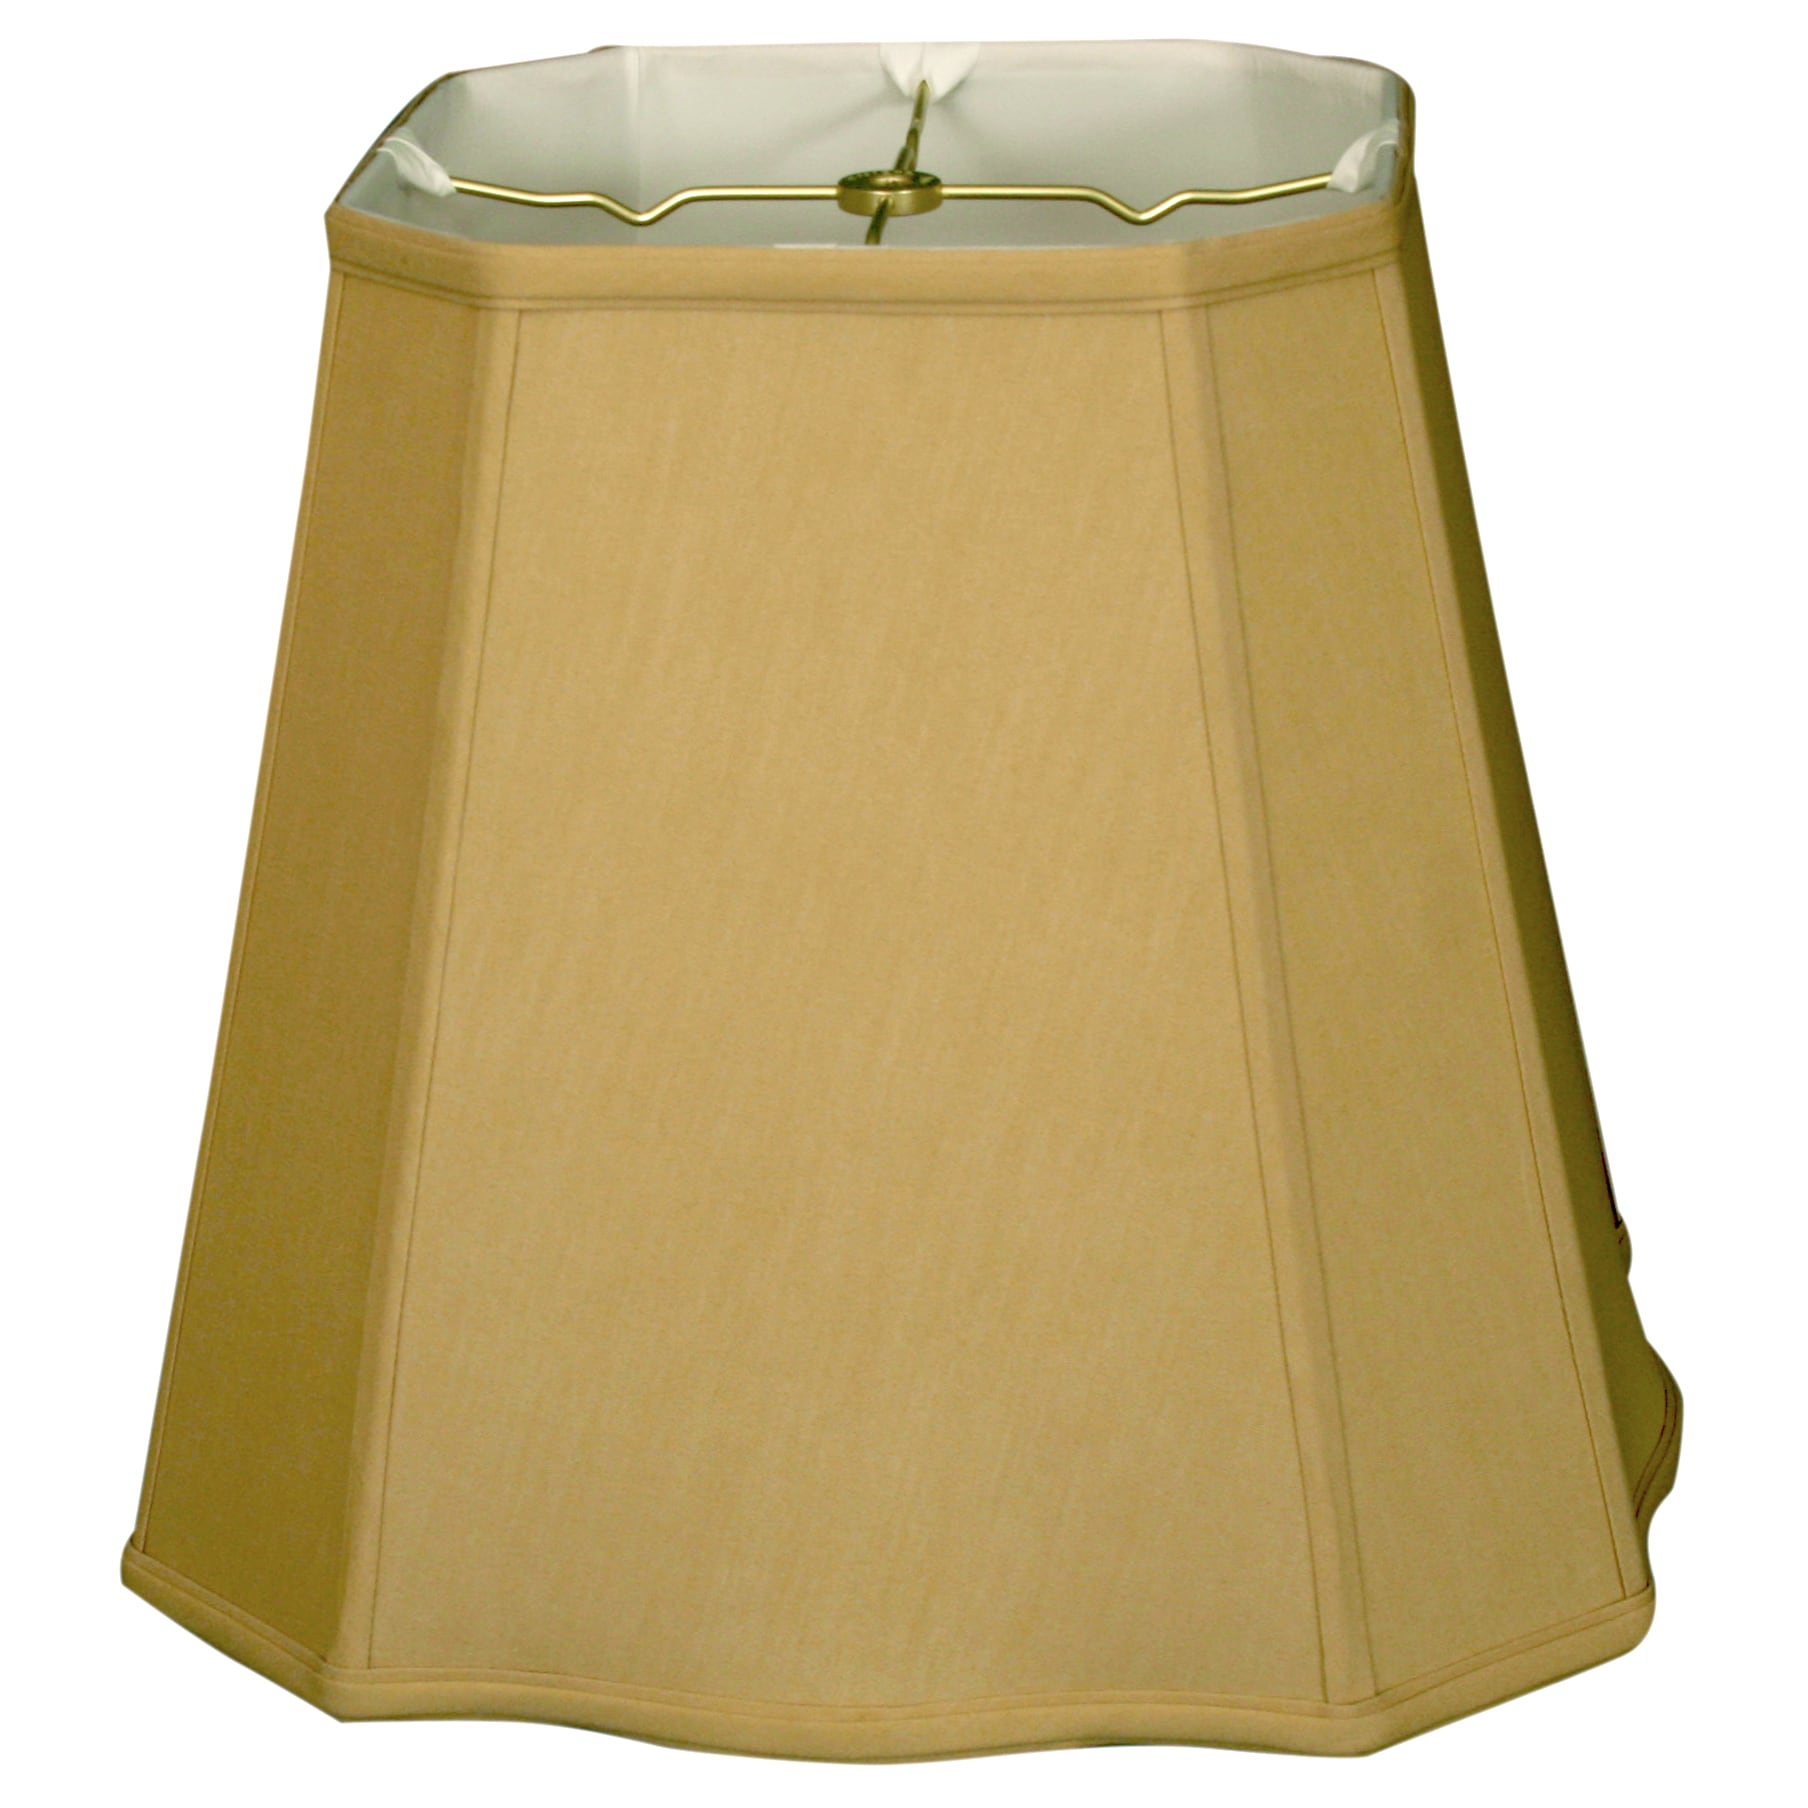 Royal designs fancy square cut corner basic lamp shade antique gold royal designs fancy square cut corner basic lamp shade antique gold 11 x 17 x aloadofball Images